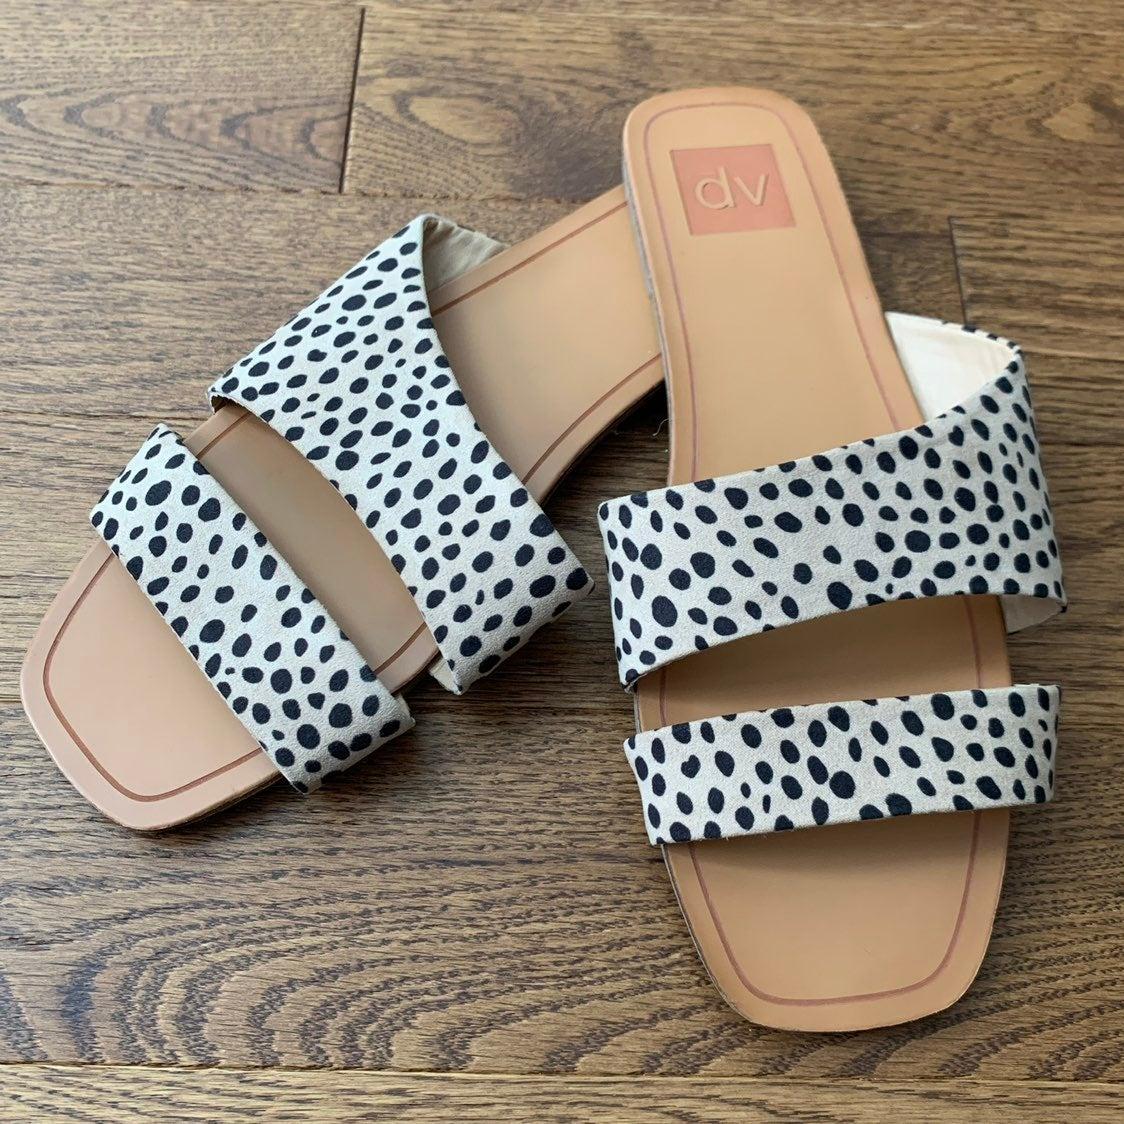 dolce vita animal print sandals 9